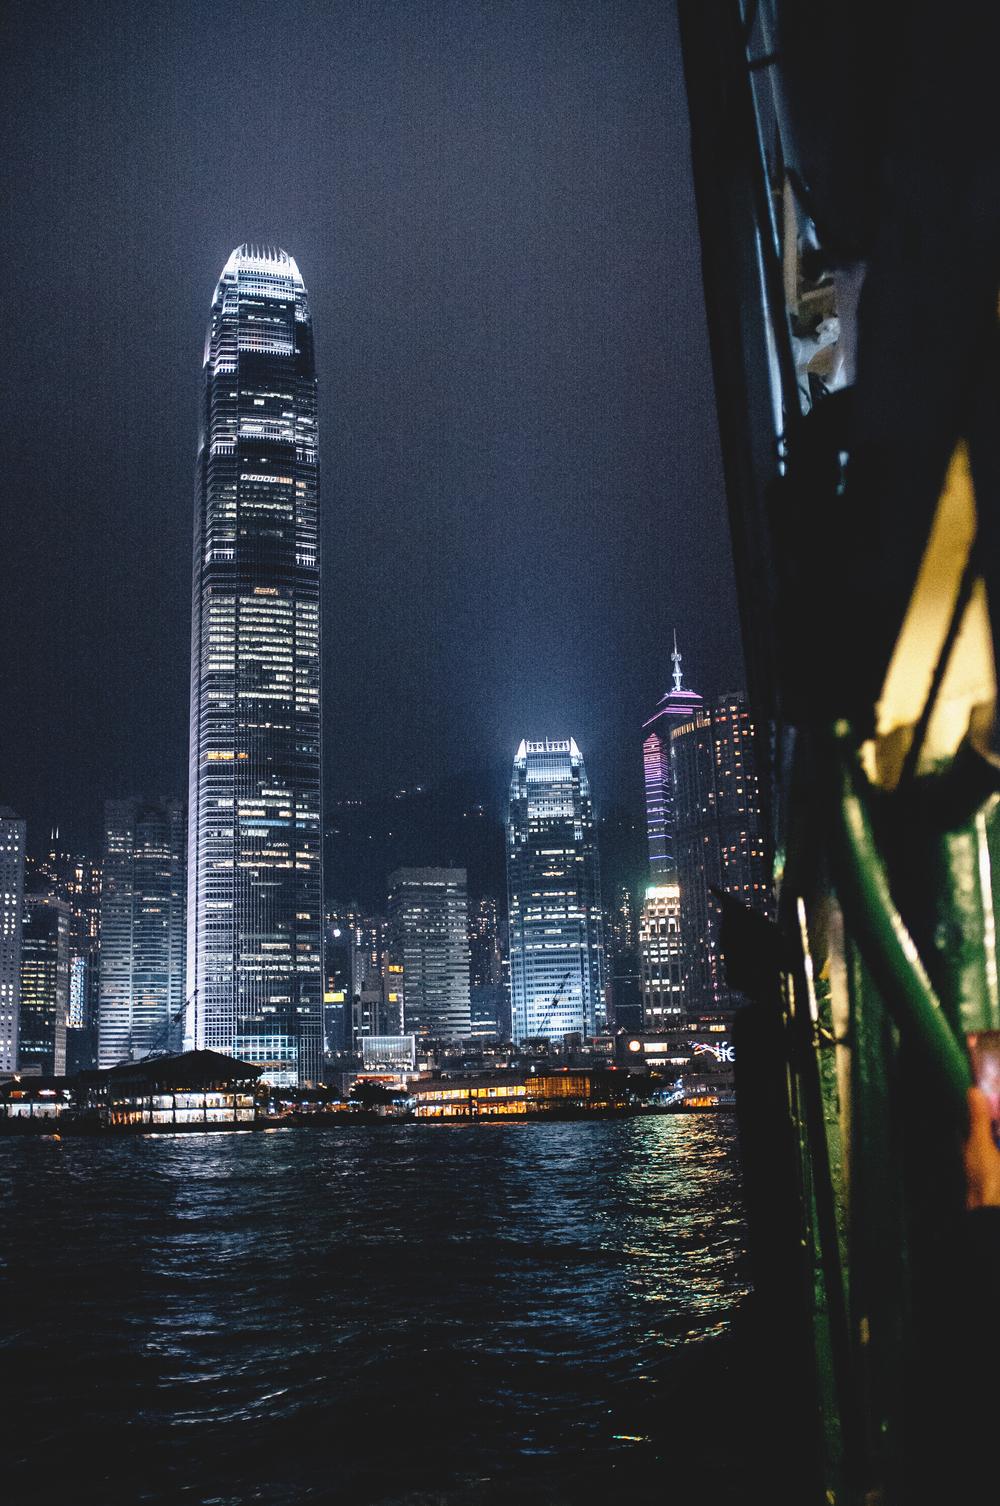 Hong Kong IFC Fade.jpg